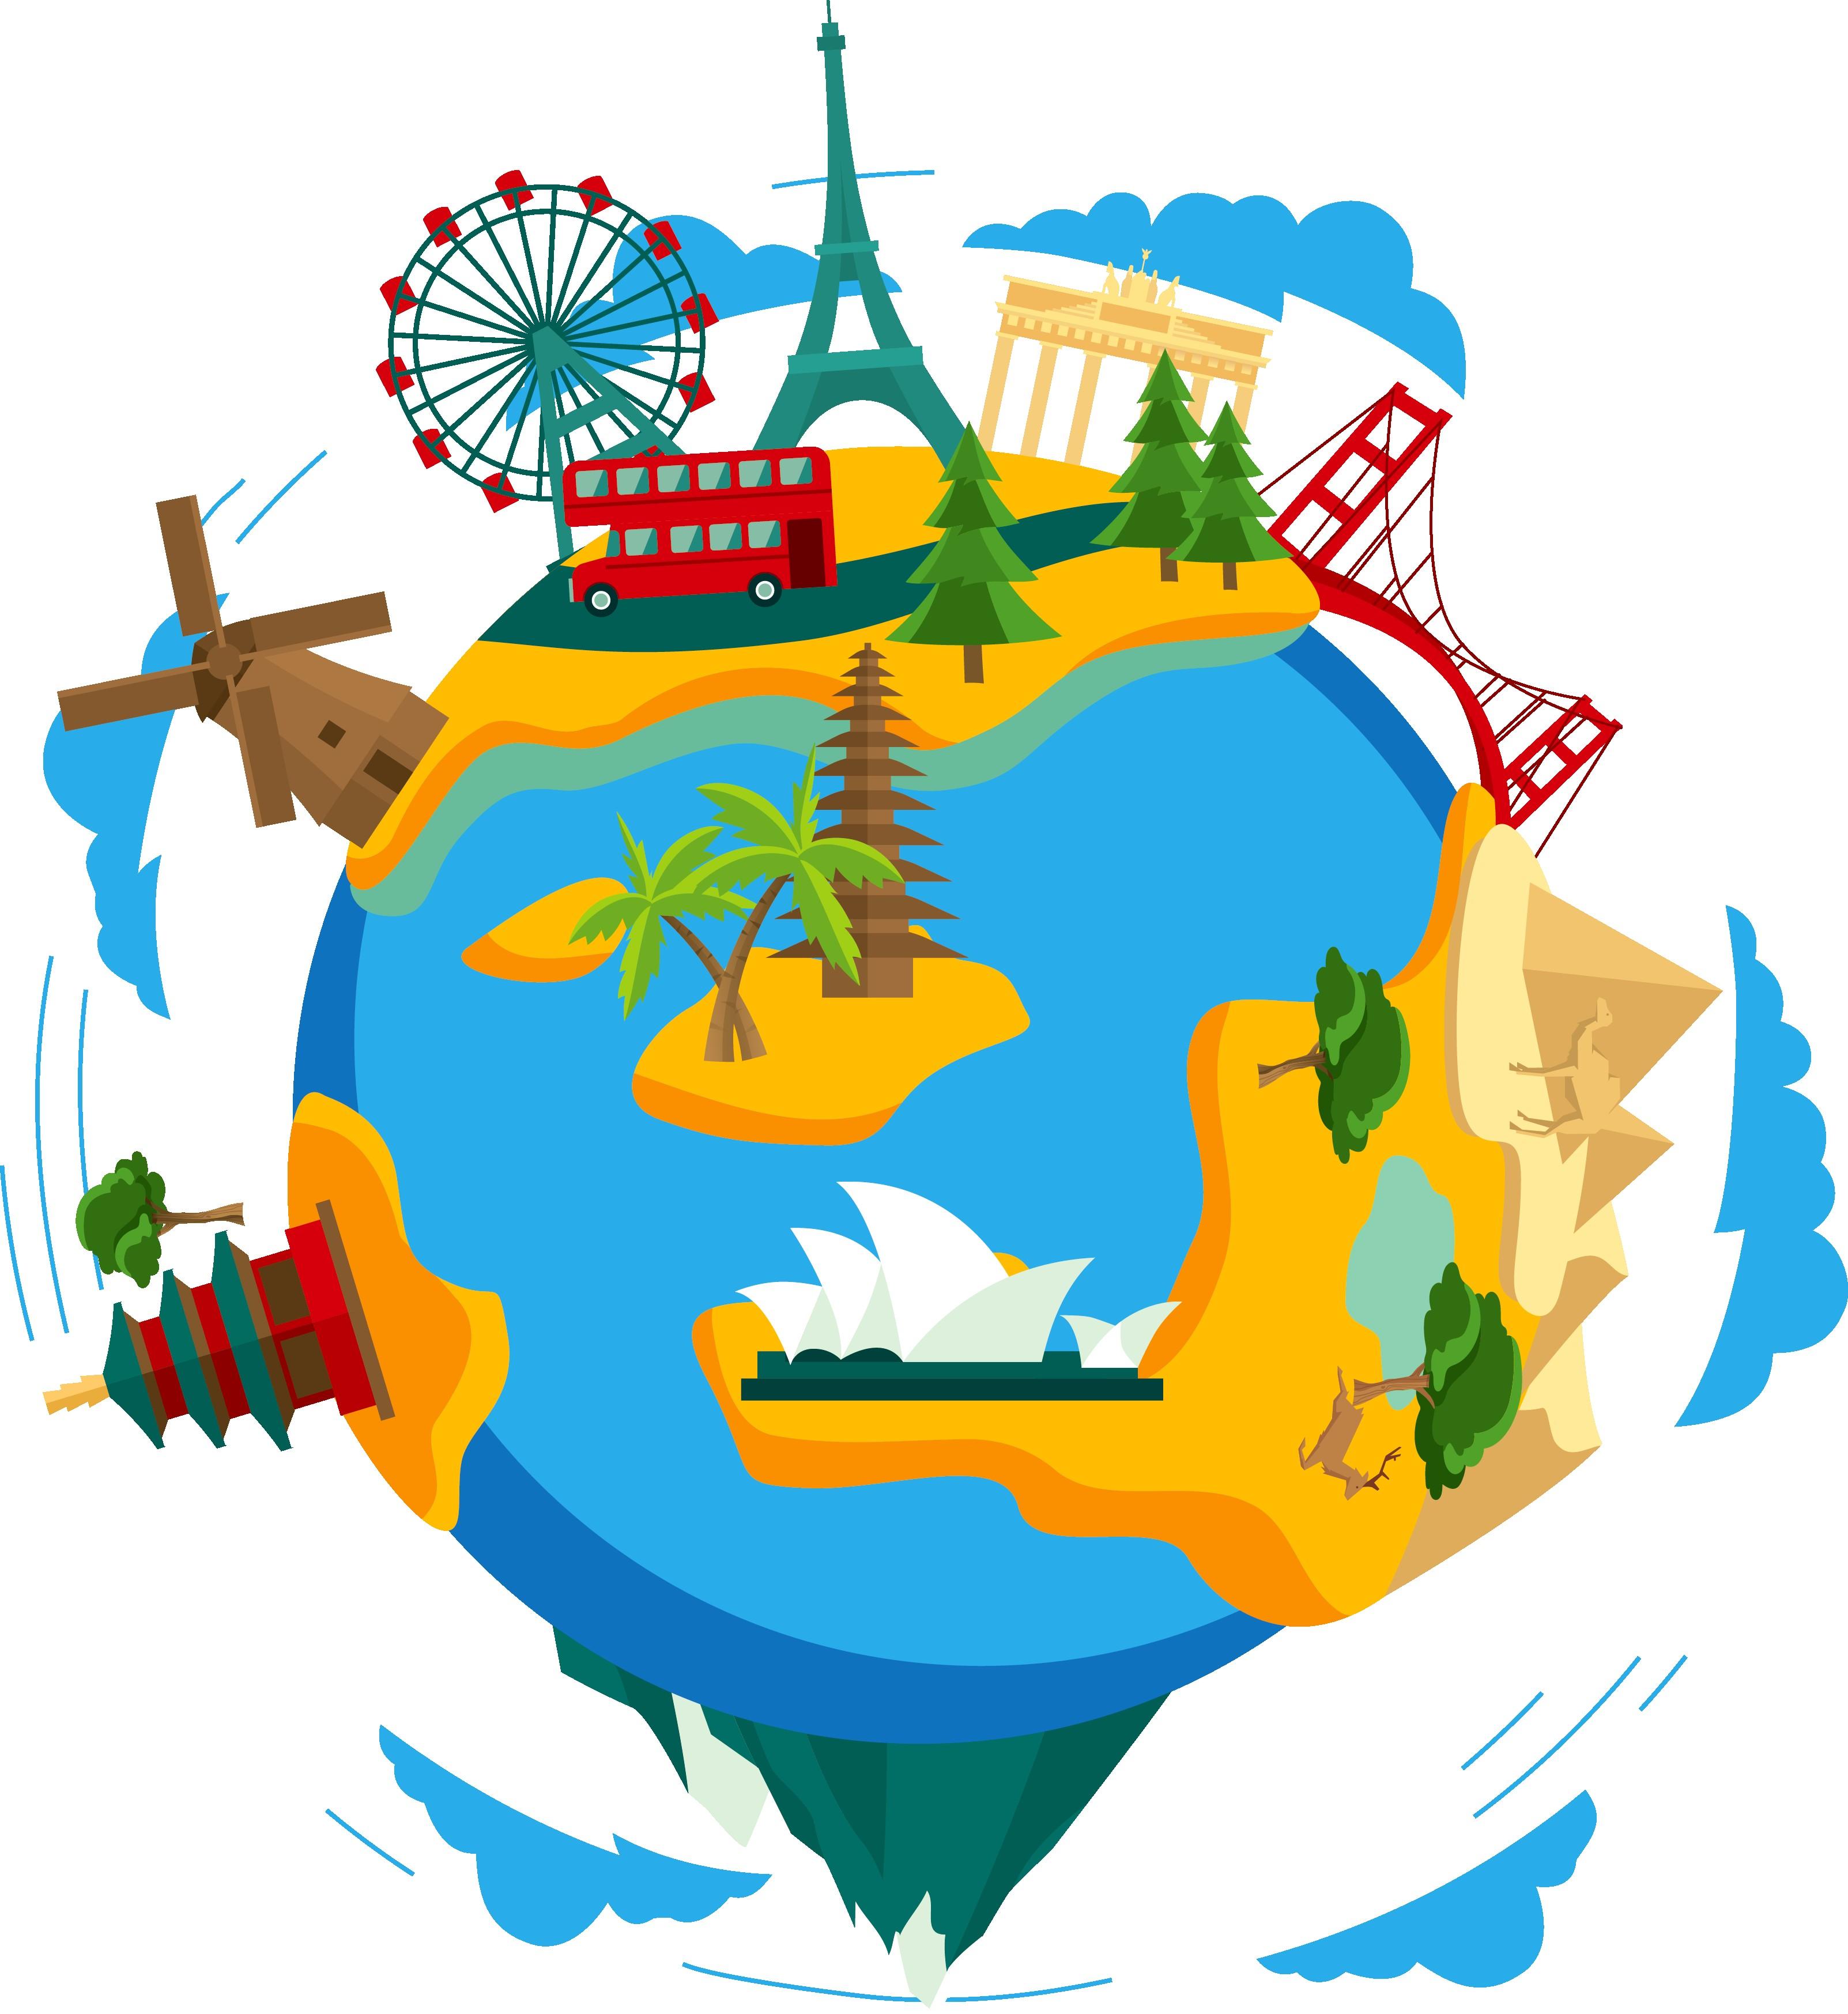 3206x3494 Kisspng Earth Clip Art Global Travel Route Vector 5a89249e8a09f4